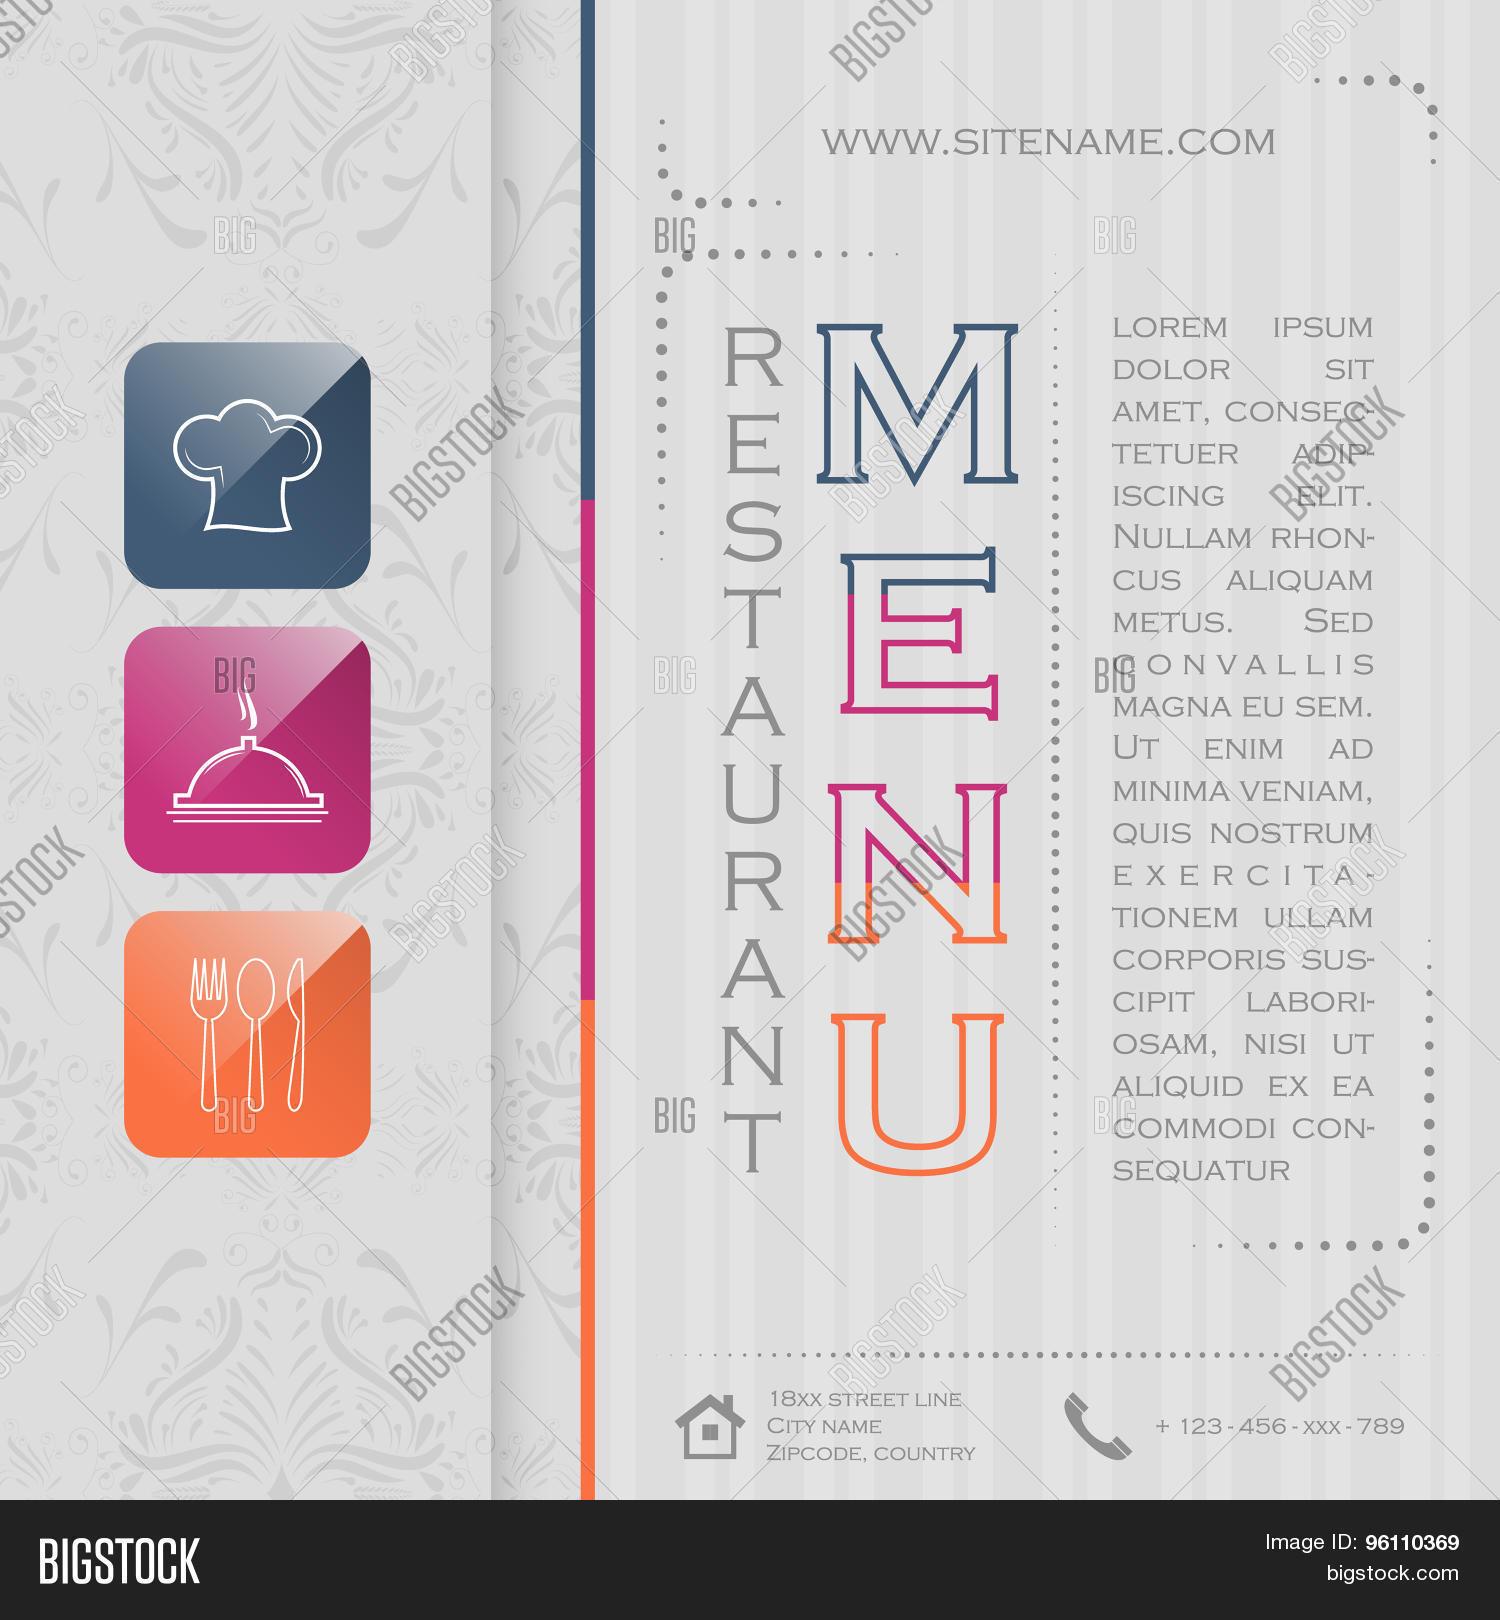 Elegant Restaurant Vector Photo Free Trial Bigstock